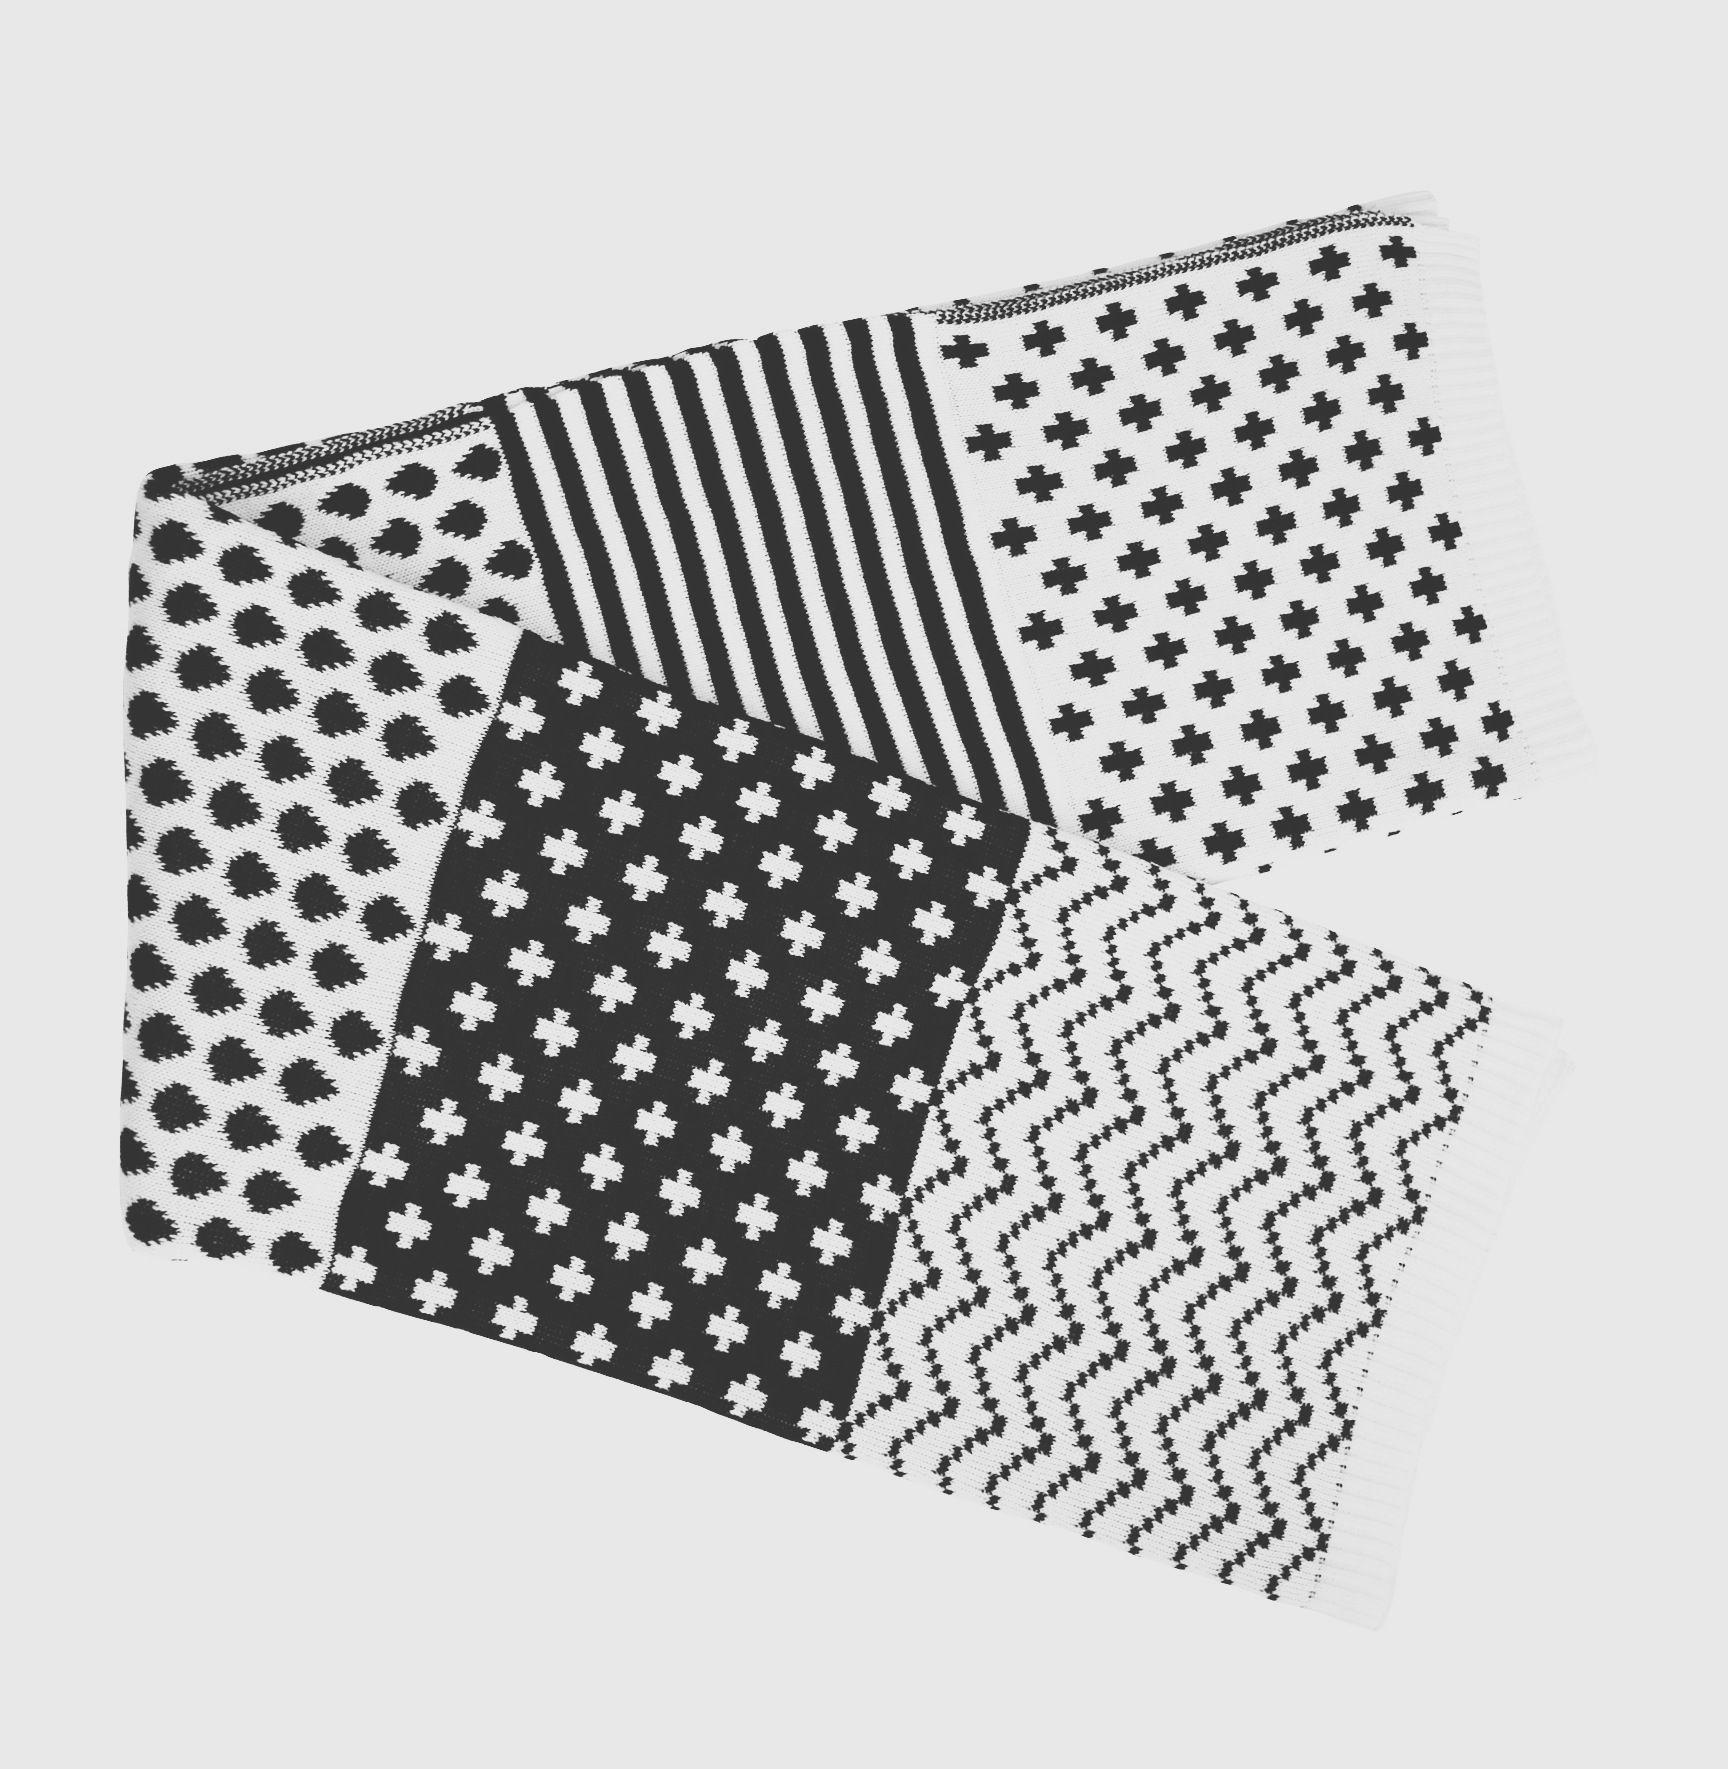 #black #white #throw #jacquard #knitted